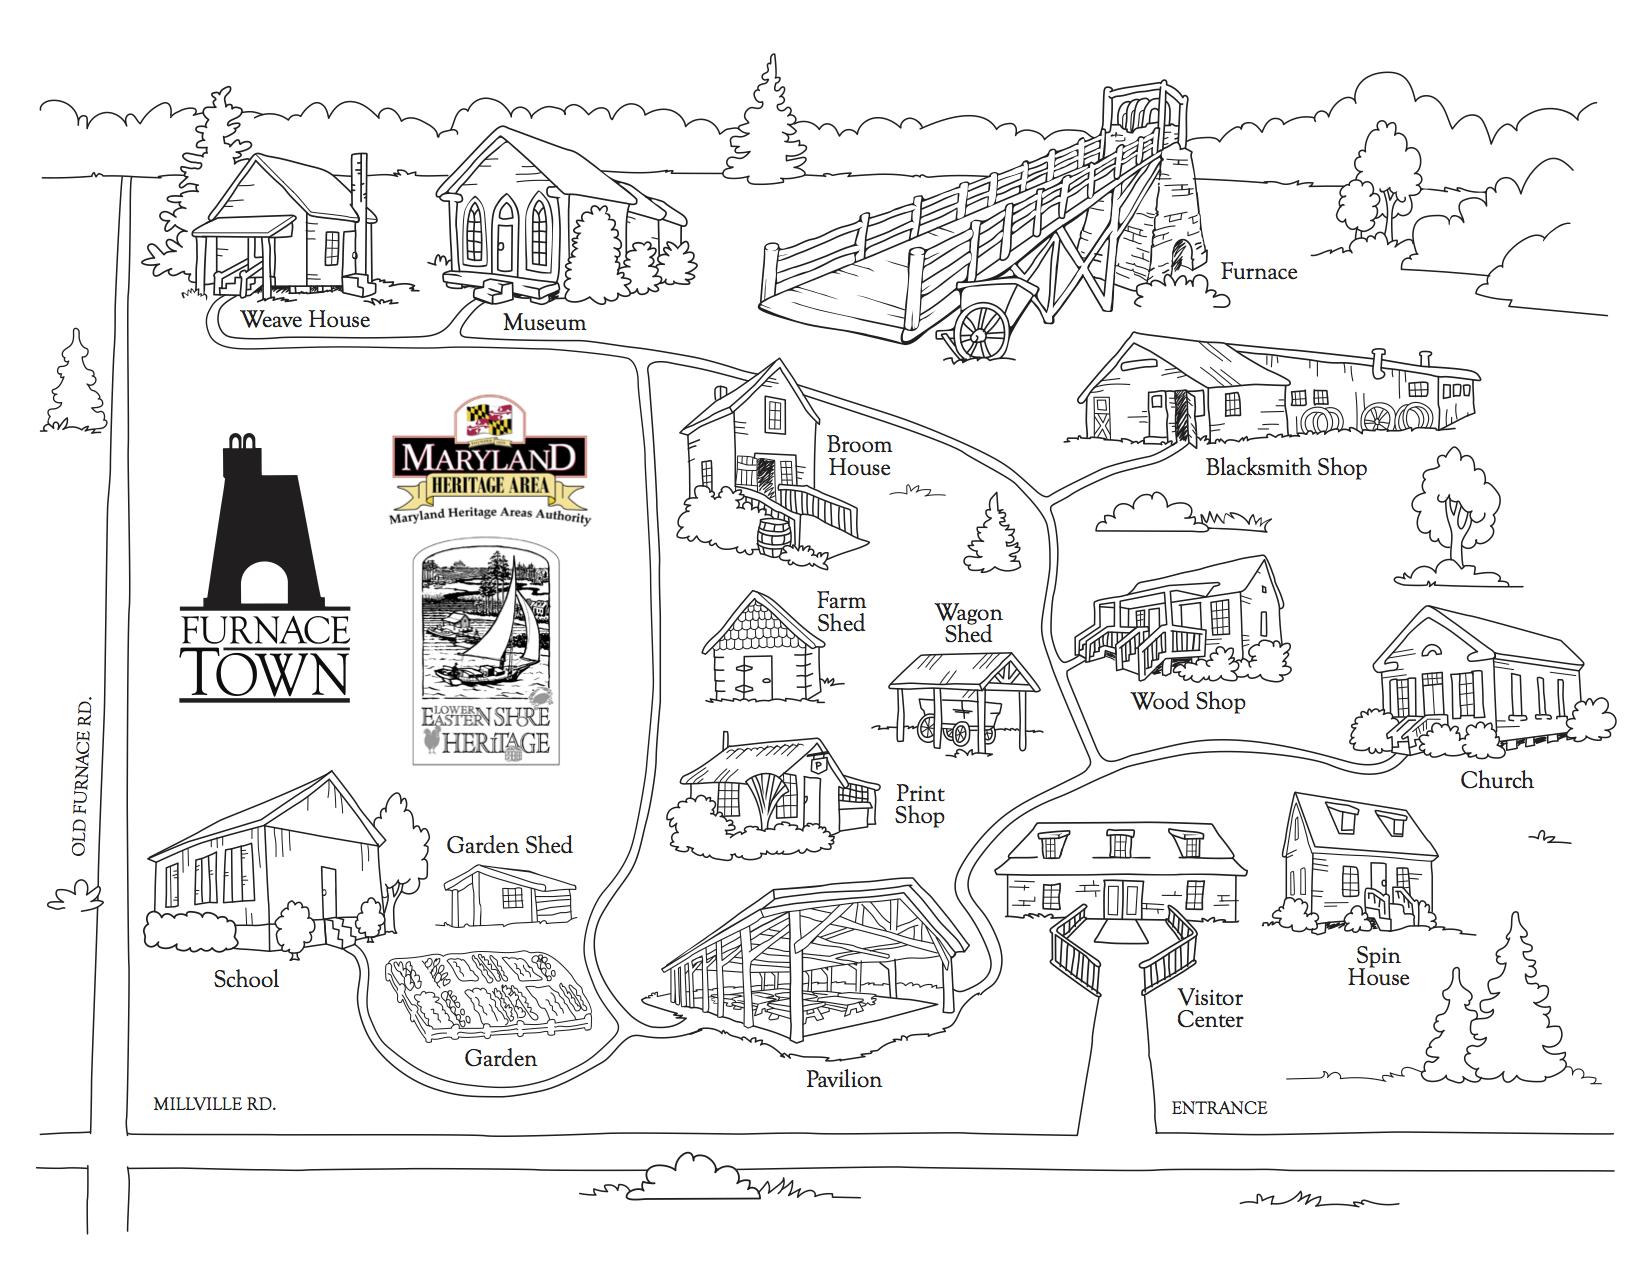 Furnace Town Living Heritage Village Map